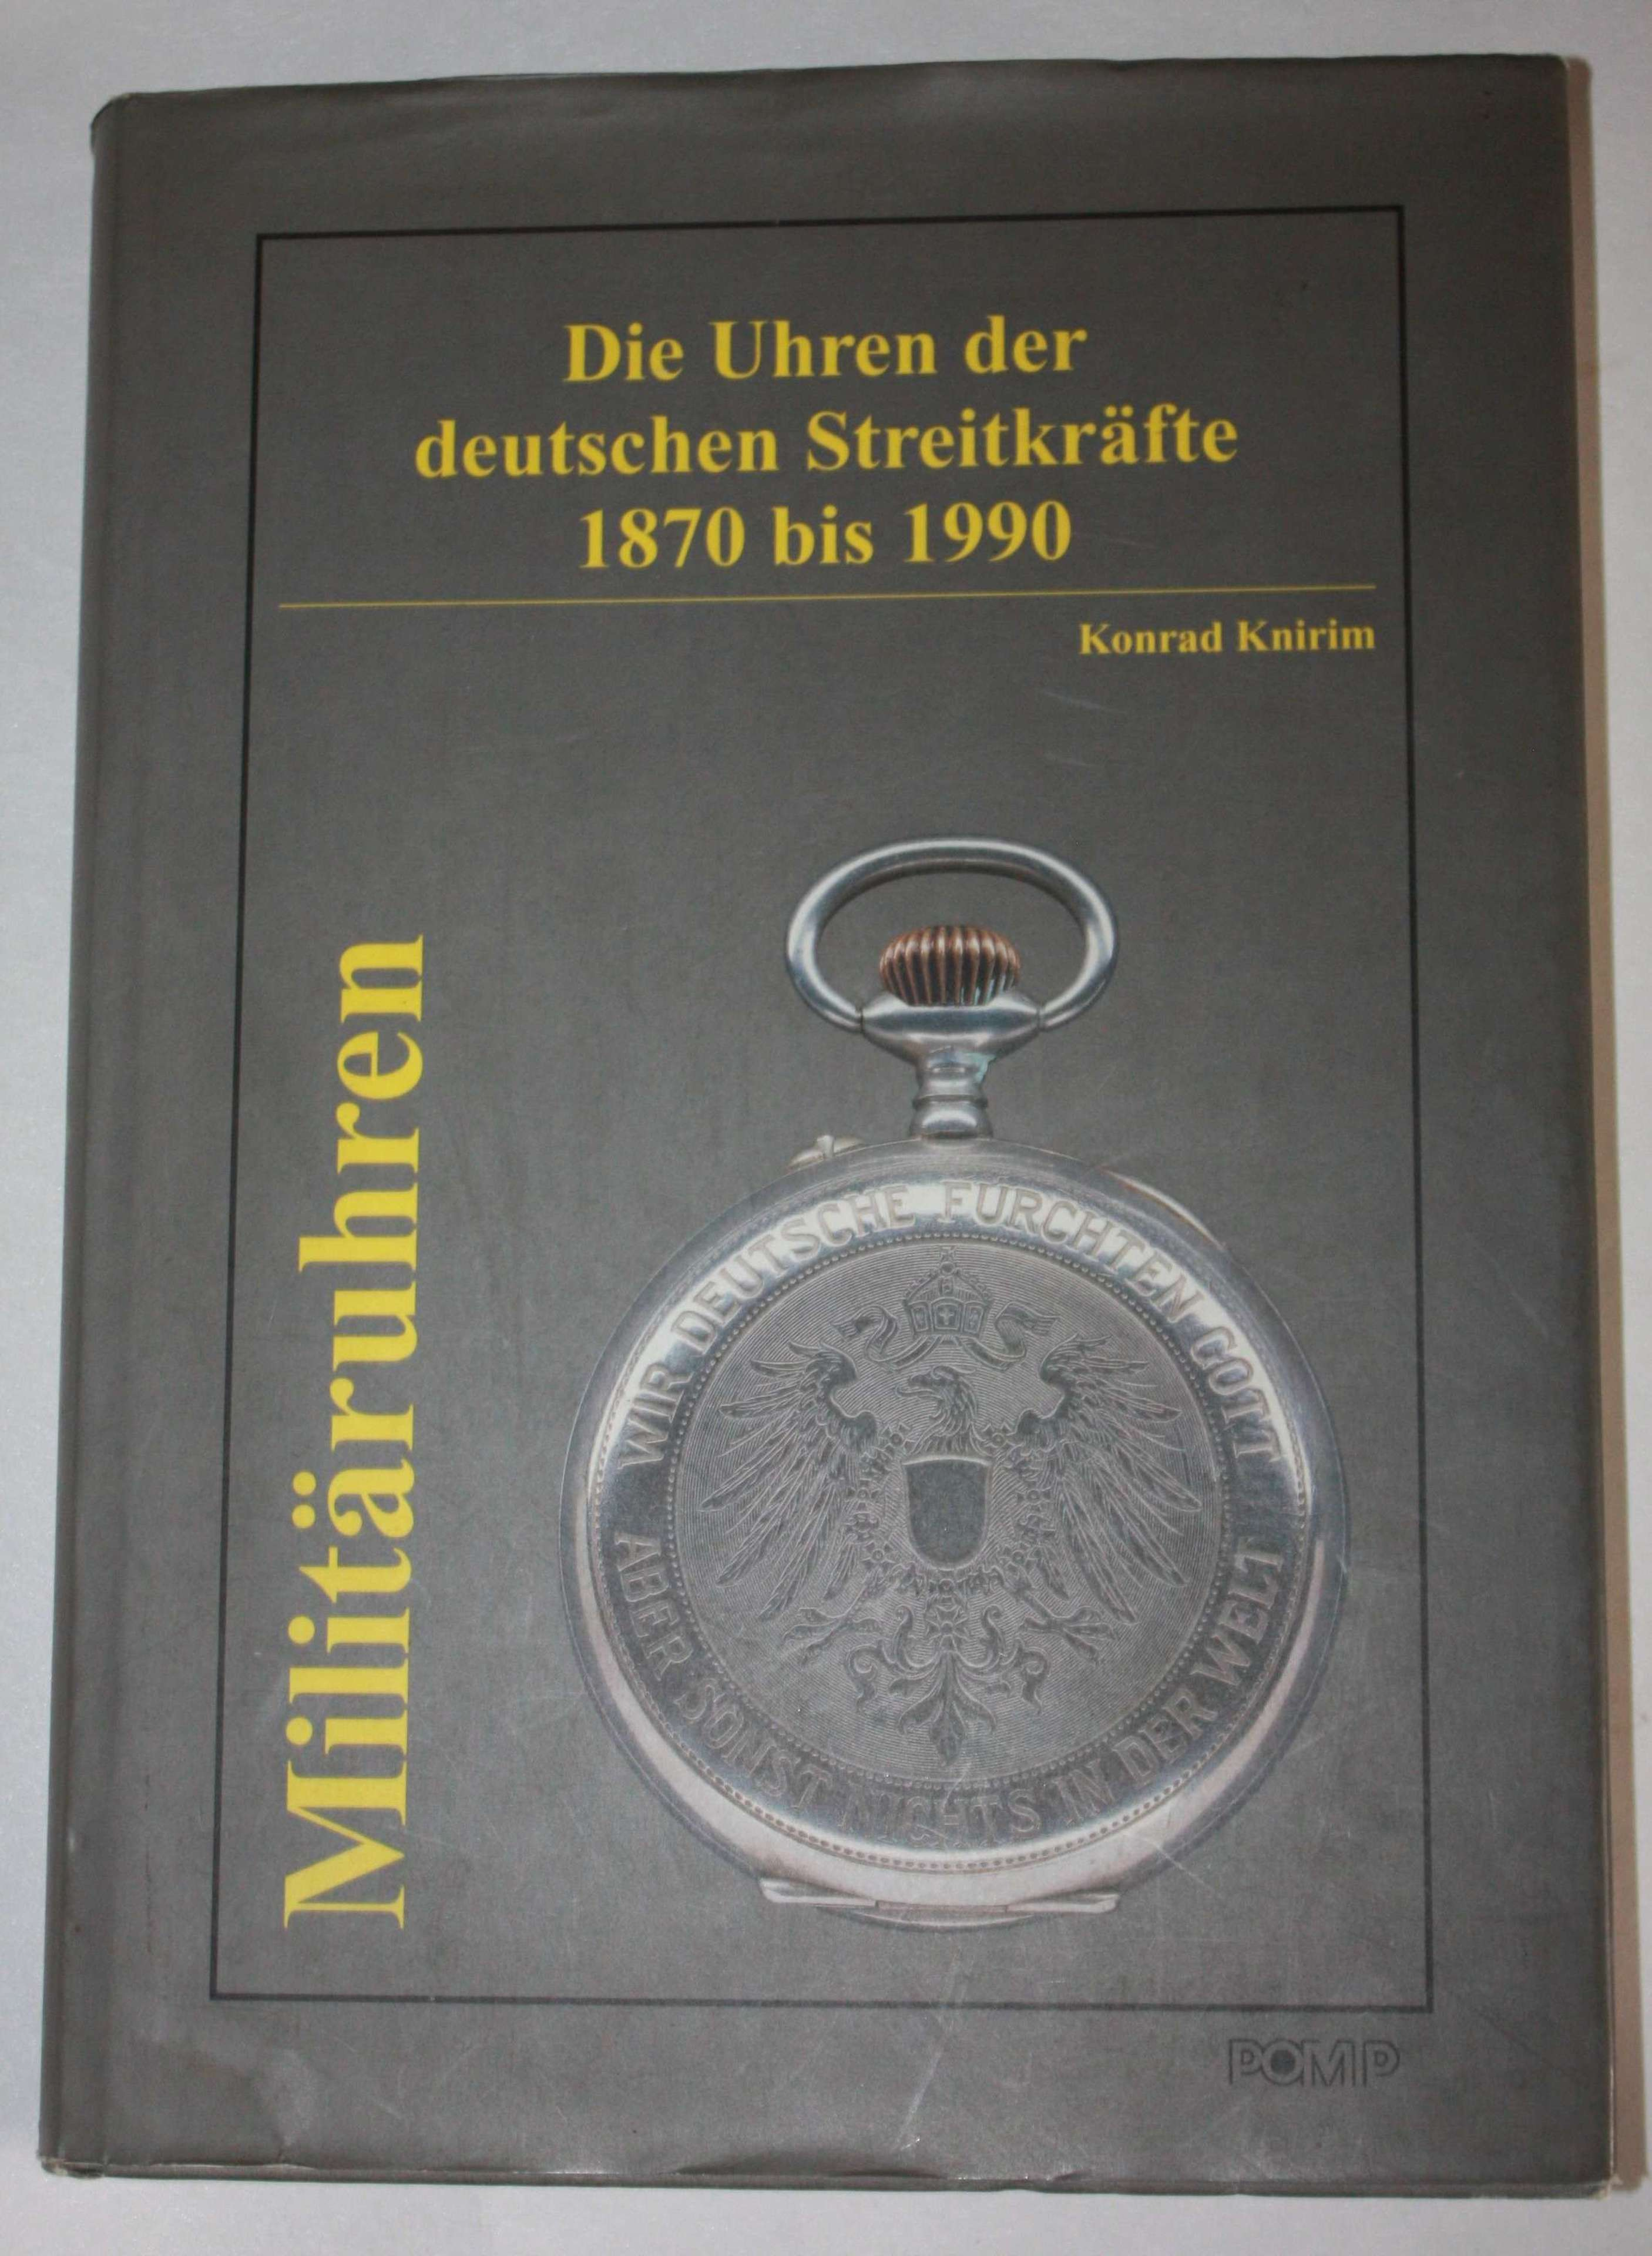 KONRAD KNIRIM WORLD RENOWNED BOOK ON GERMAN WATCHES 1870-1990